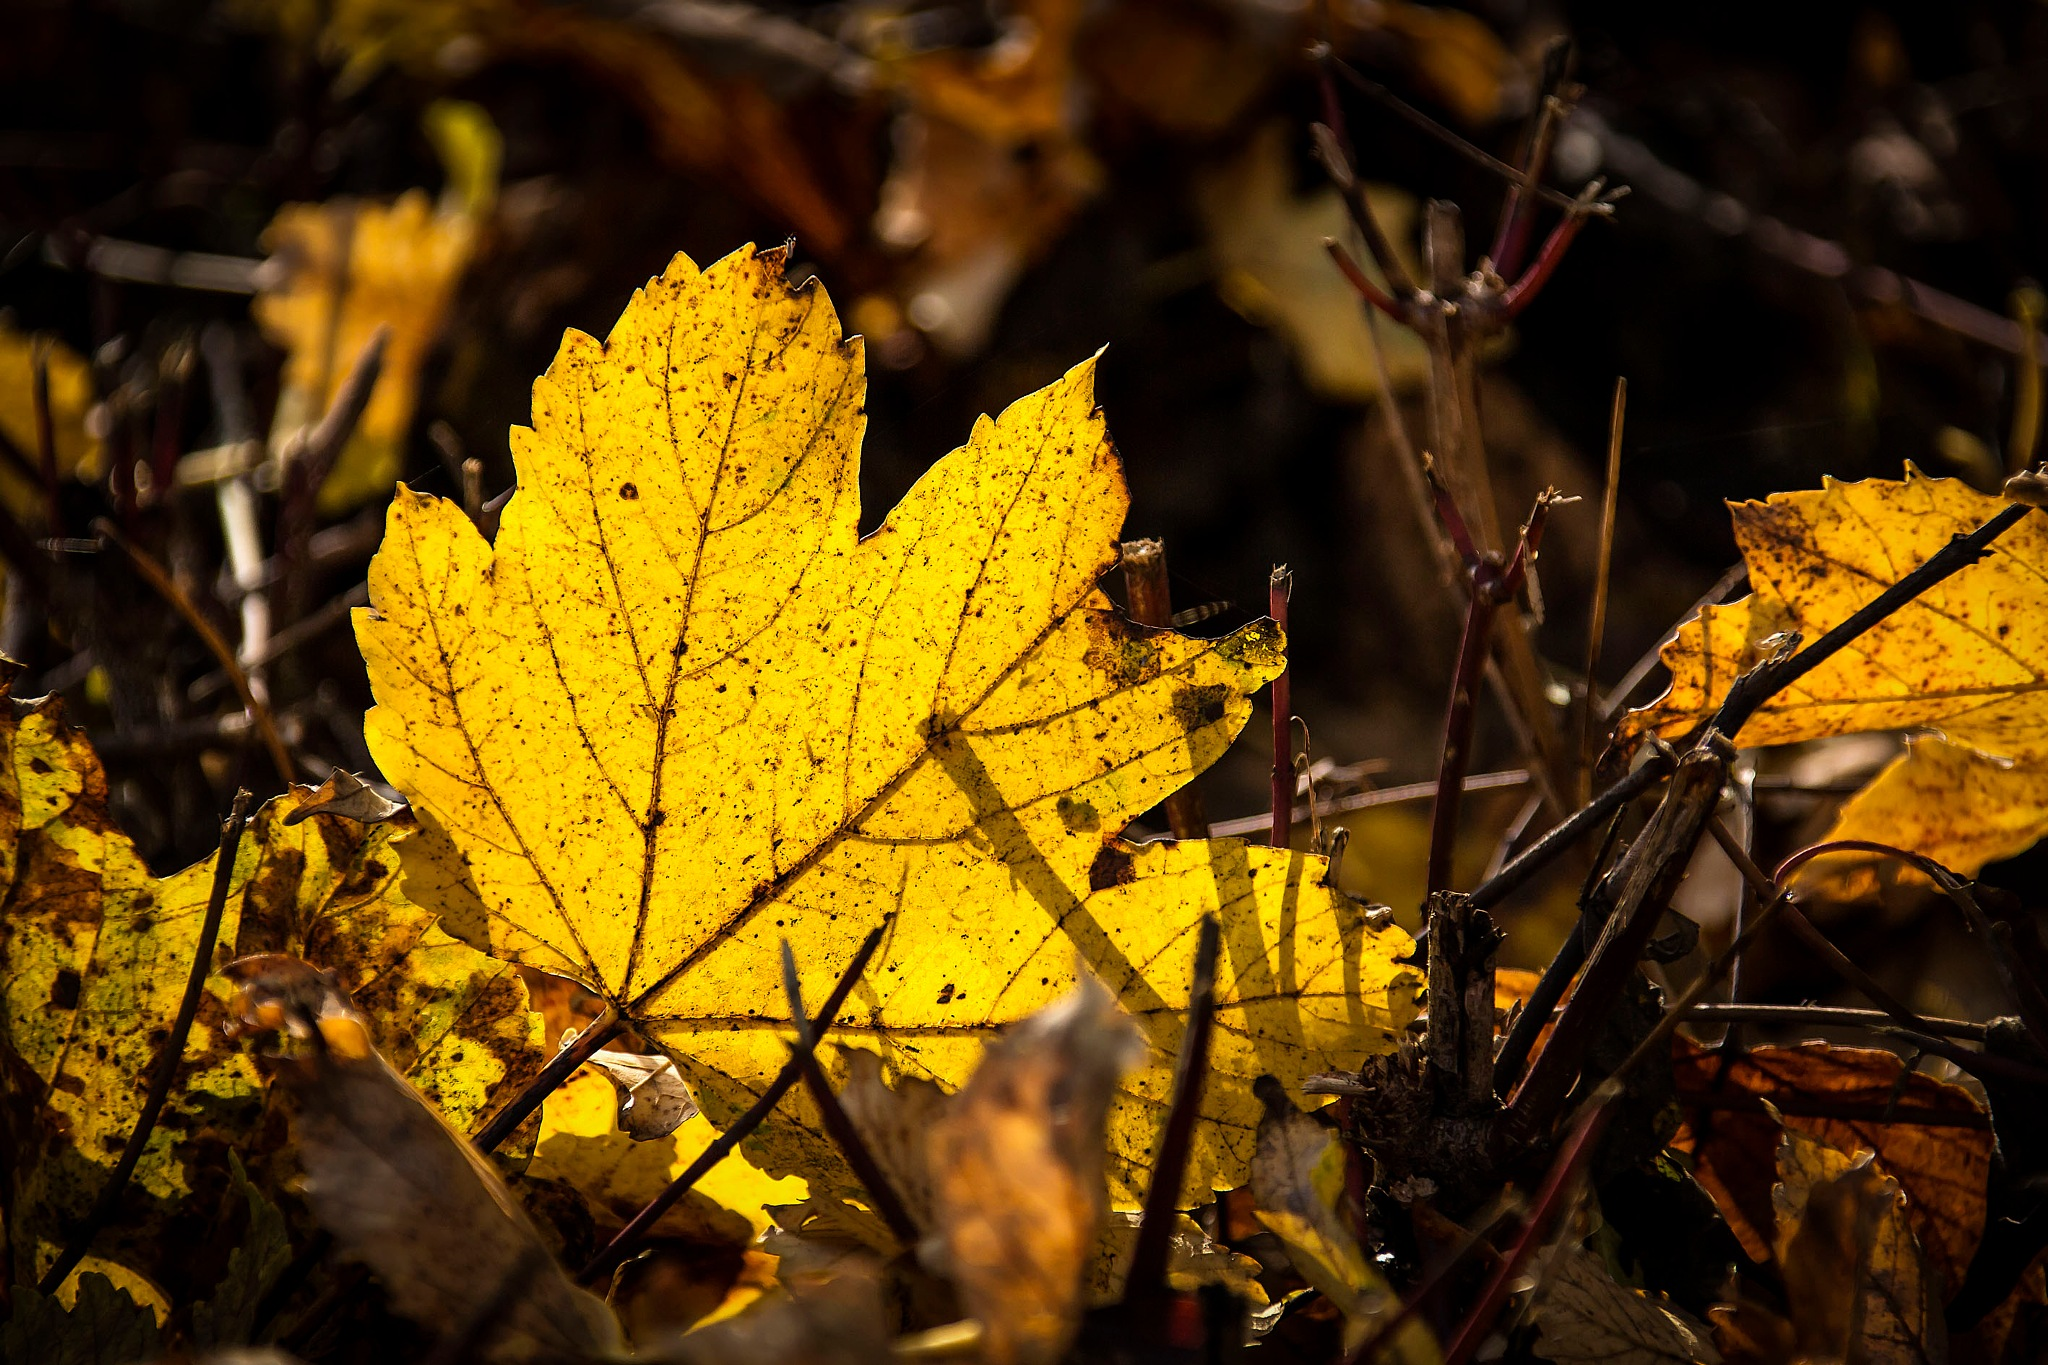 Autumn light by AdolfBeck